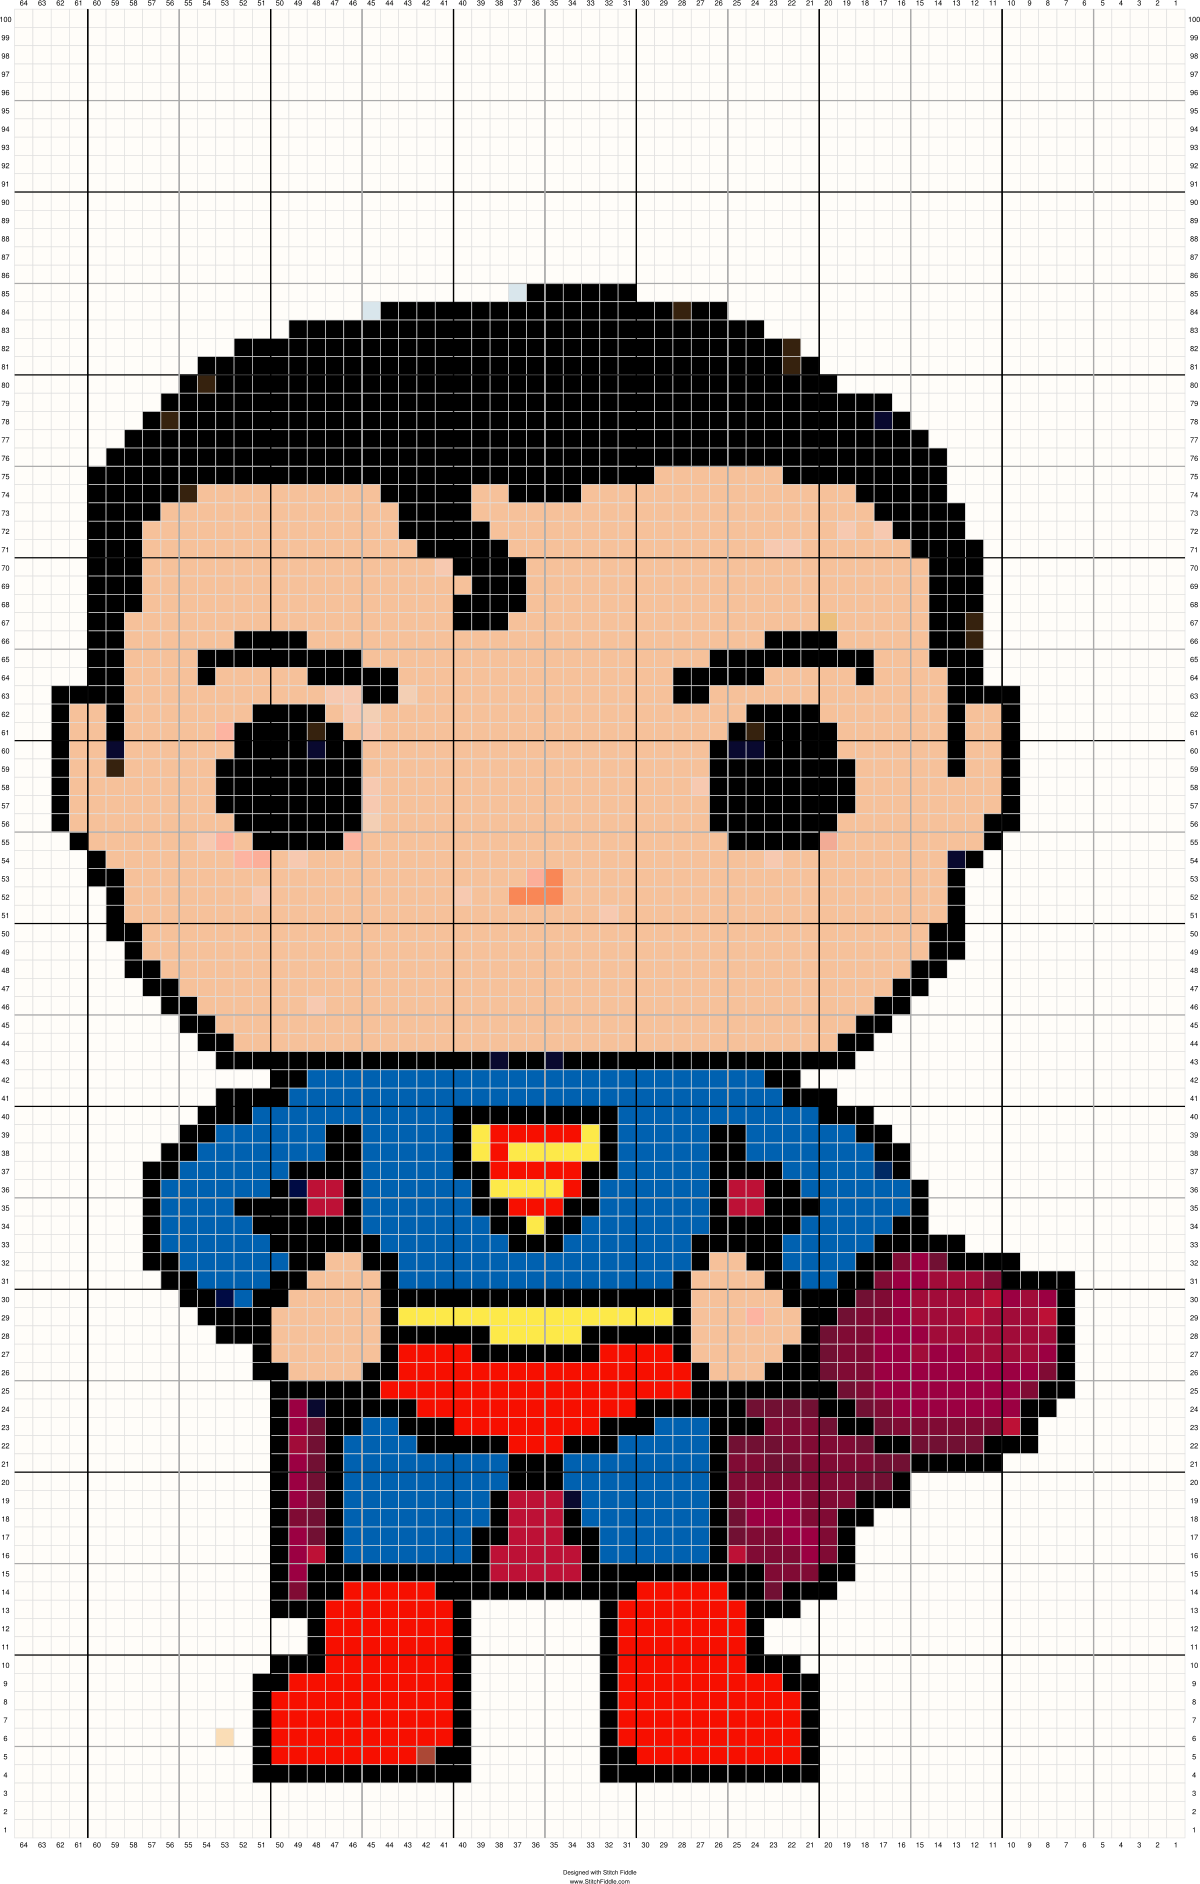 Superman Cross Stitch Pattern Maker Cross Stitch Patterns